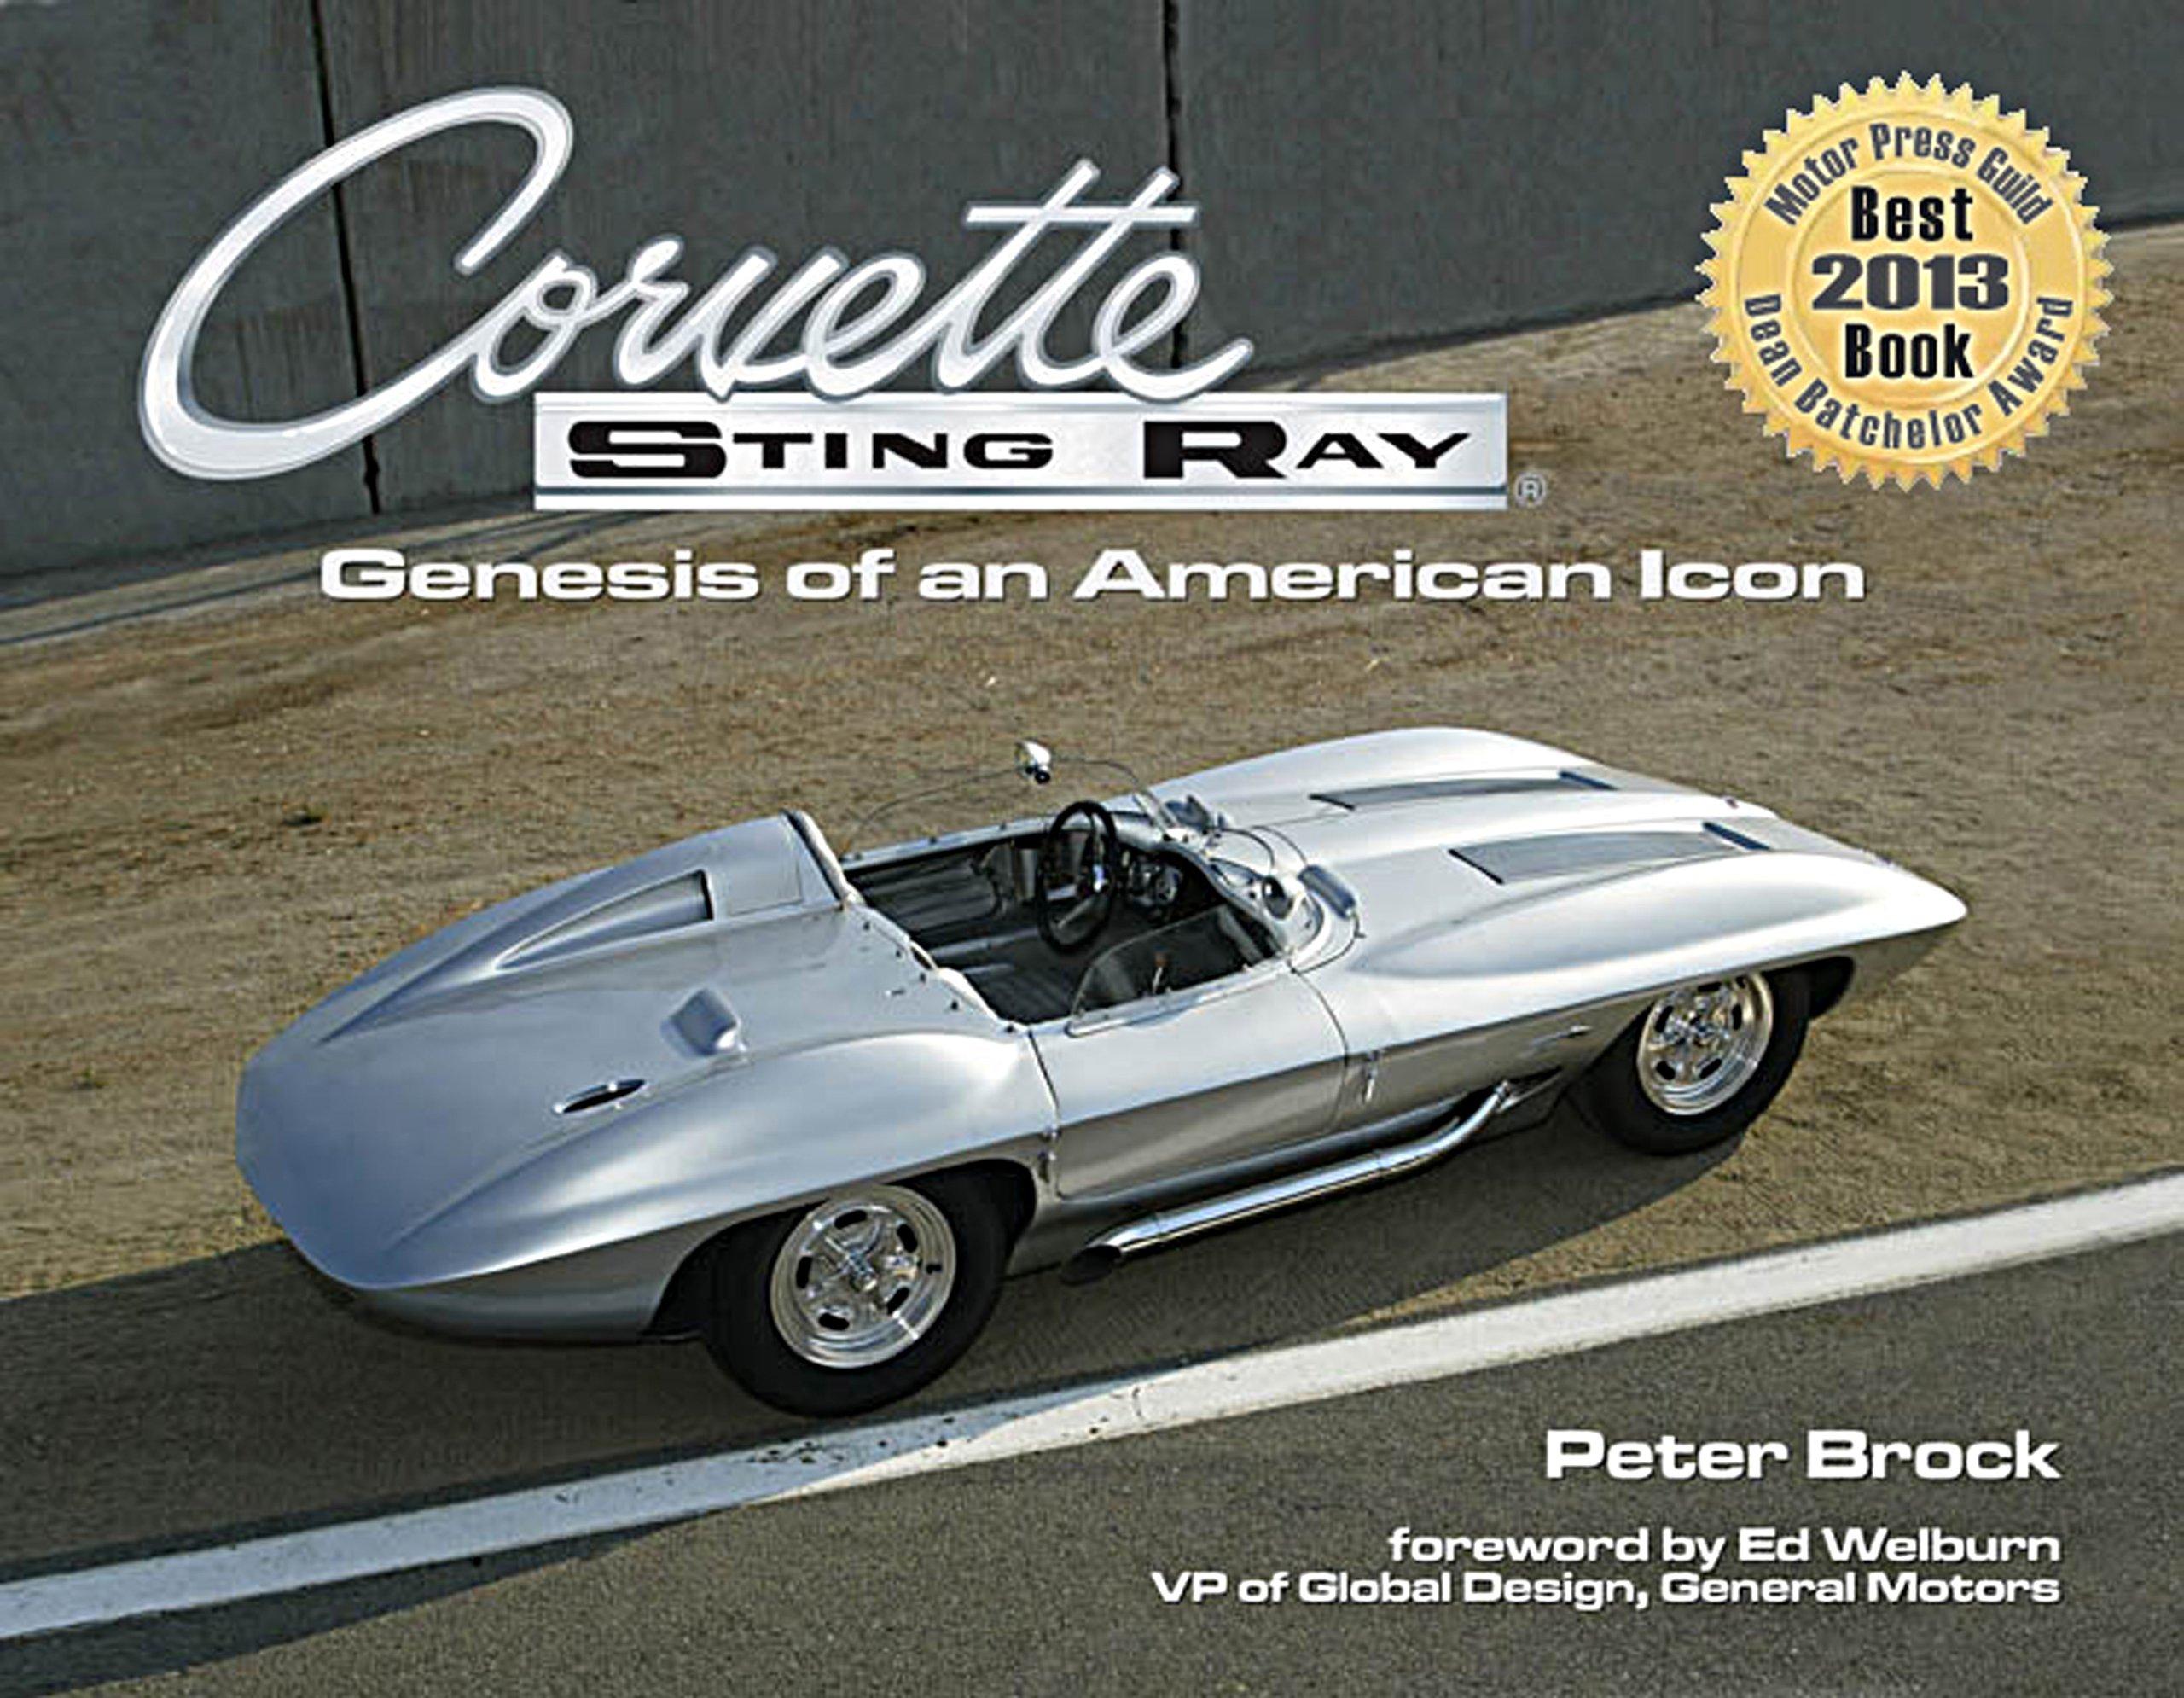 Corvette Sting Ray Genesis Of An American Icon: Peter Brock, Vp Of Global  Design At General Motors Ed Welburn: 9780989537209: Amazon: Books